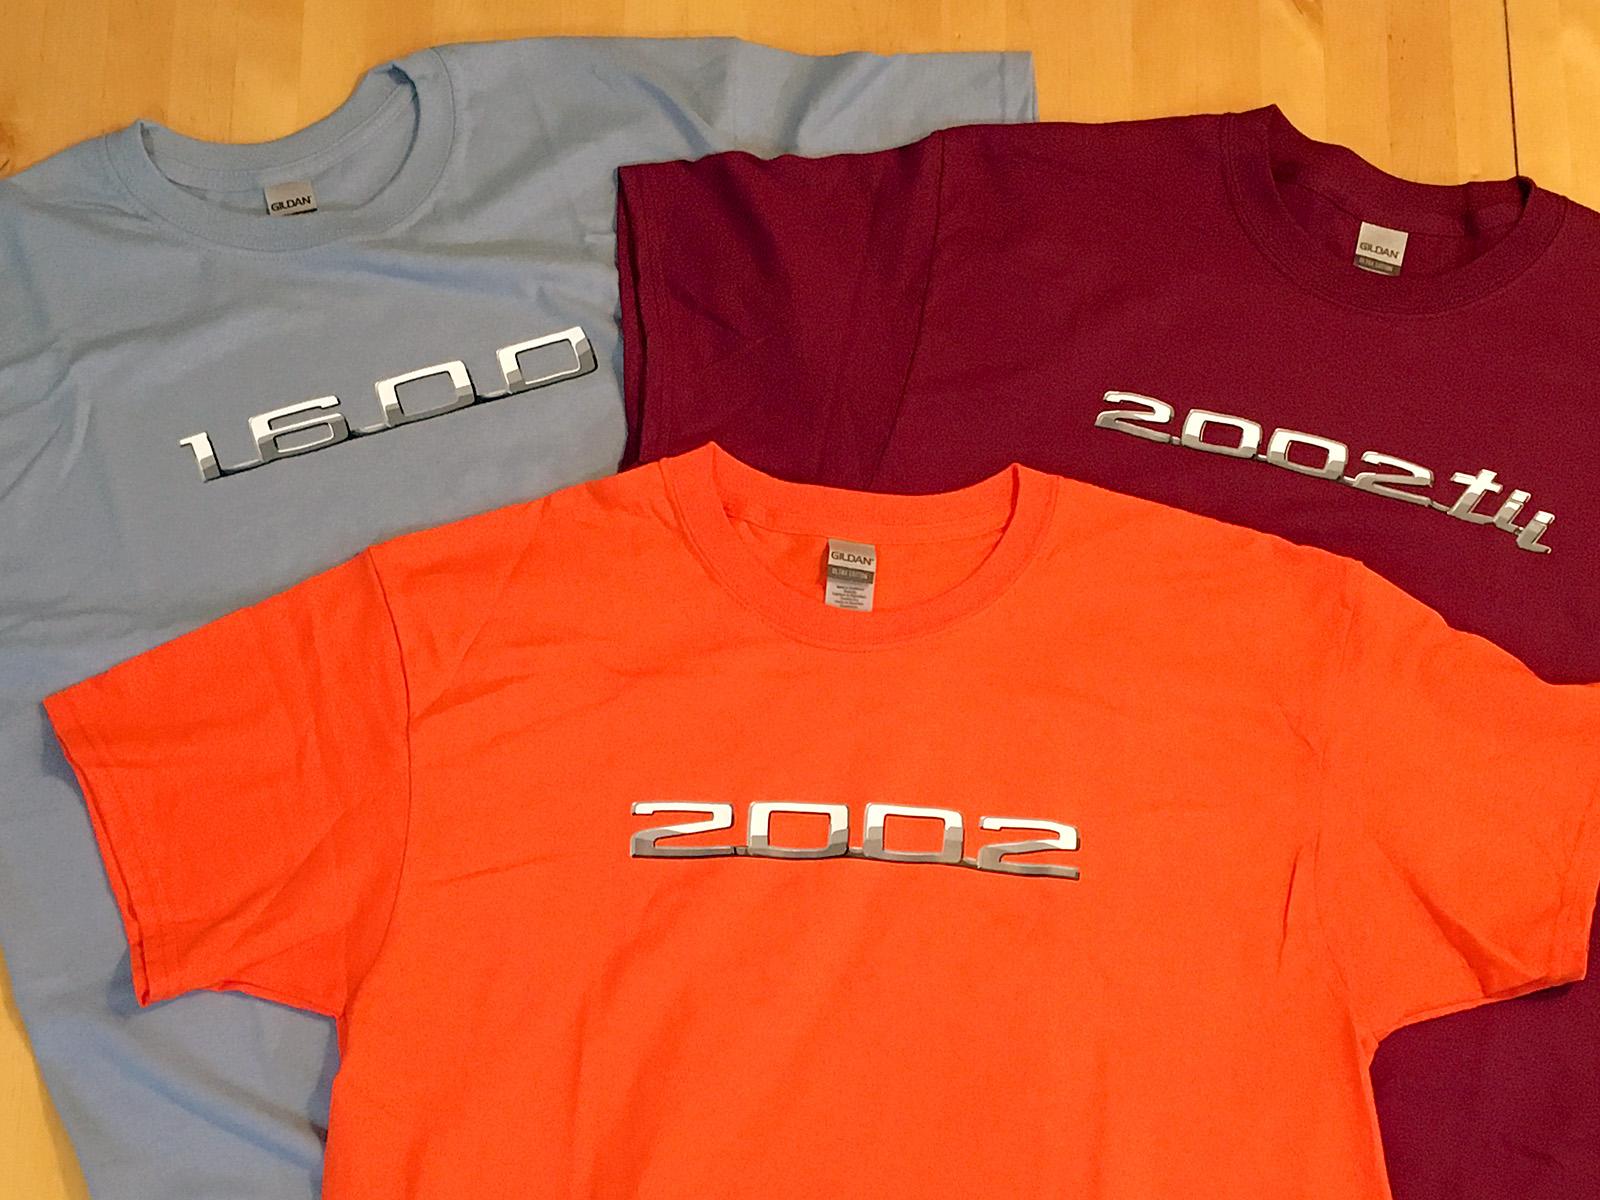 1_2002series